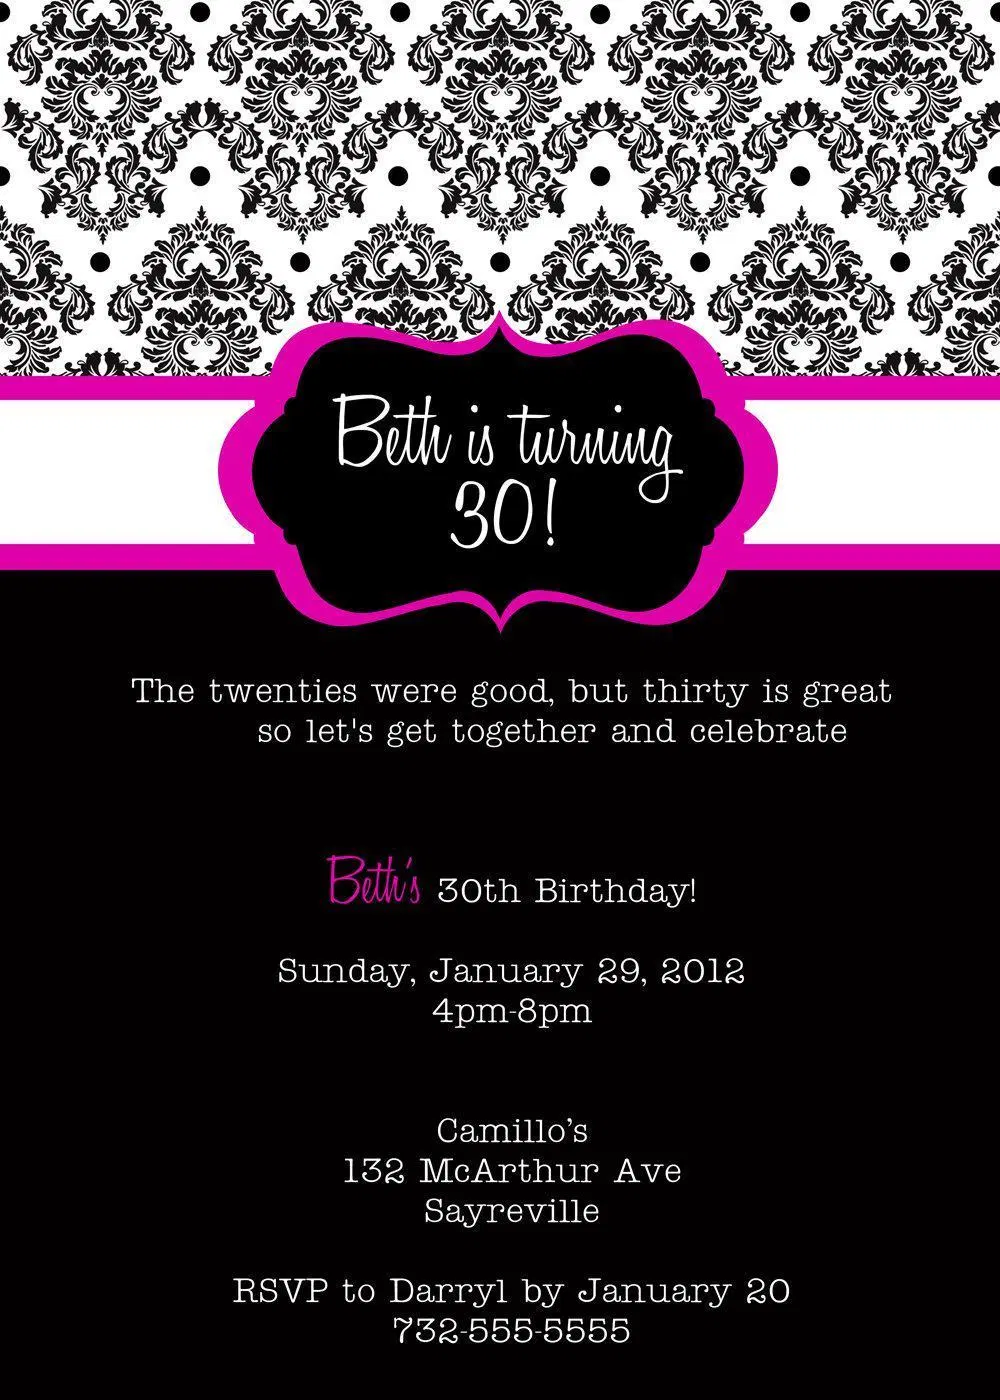 Birthday Invitation 30th Birthday Invitation Templates Superb Invitation Superb Invitation